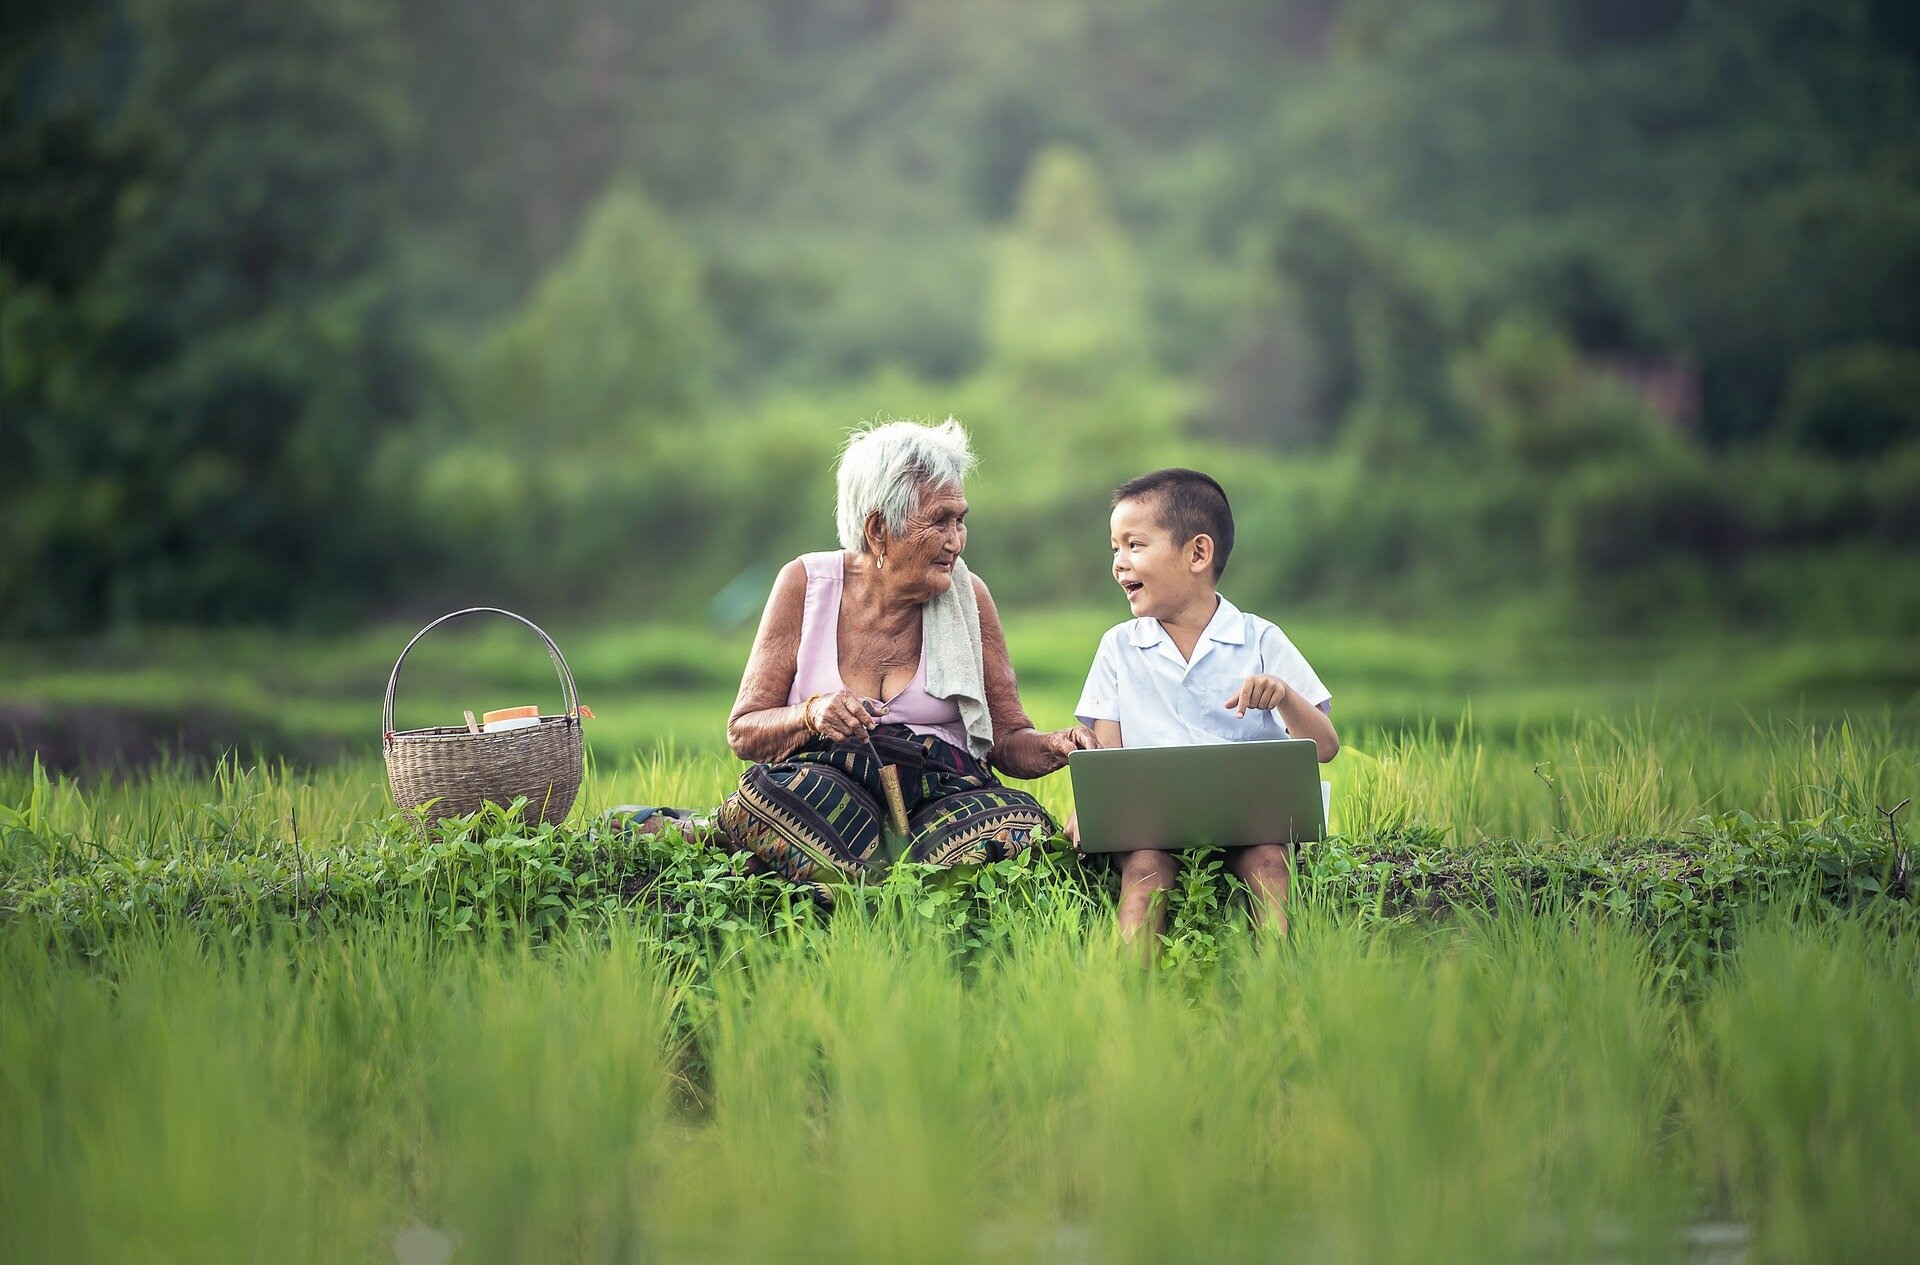 grandmother-1822564_1920.jpg